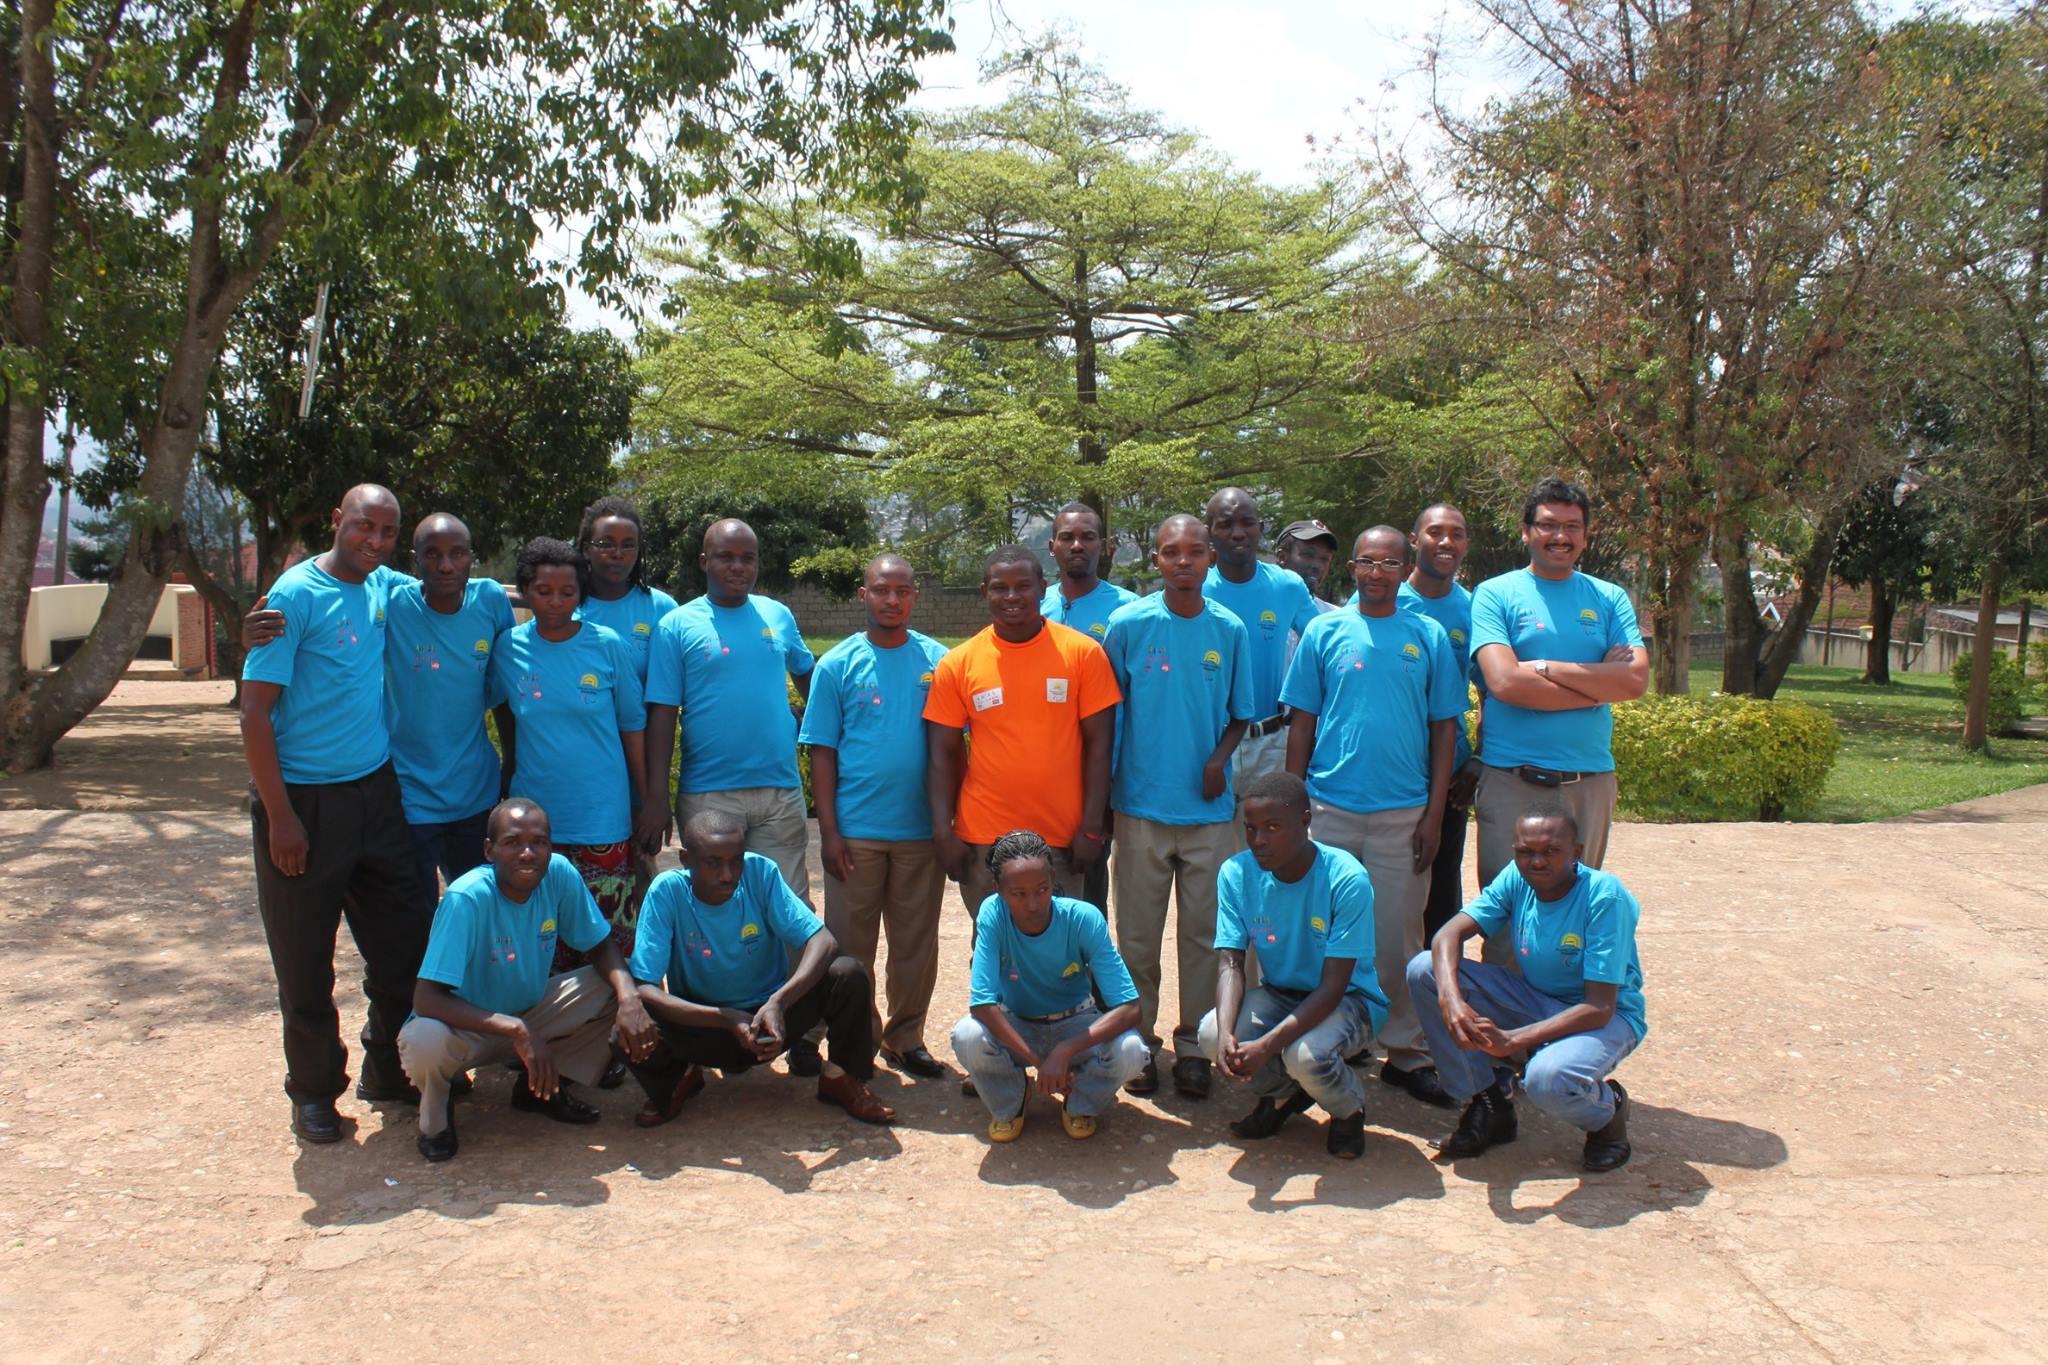 The latest Agitos Foundation workshop has been held in Kigali, Rwanda to help boost Paralympic sport across ©Rwanda NPC